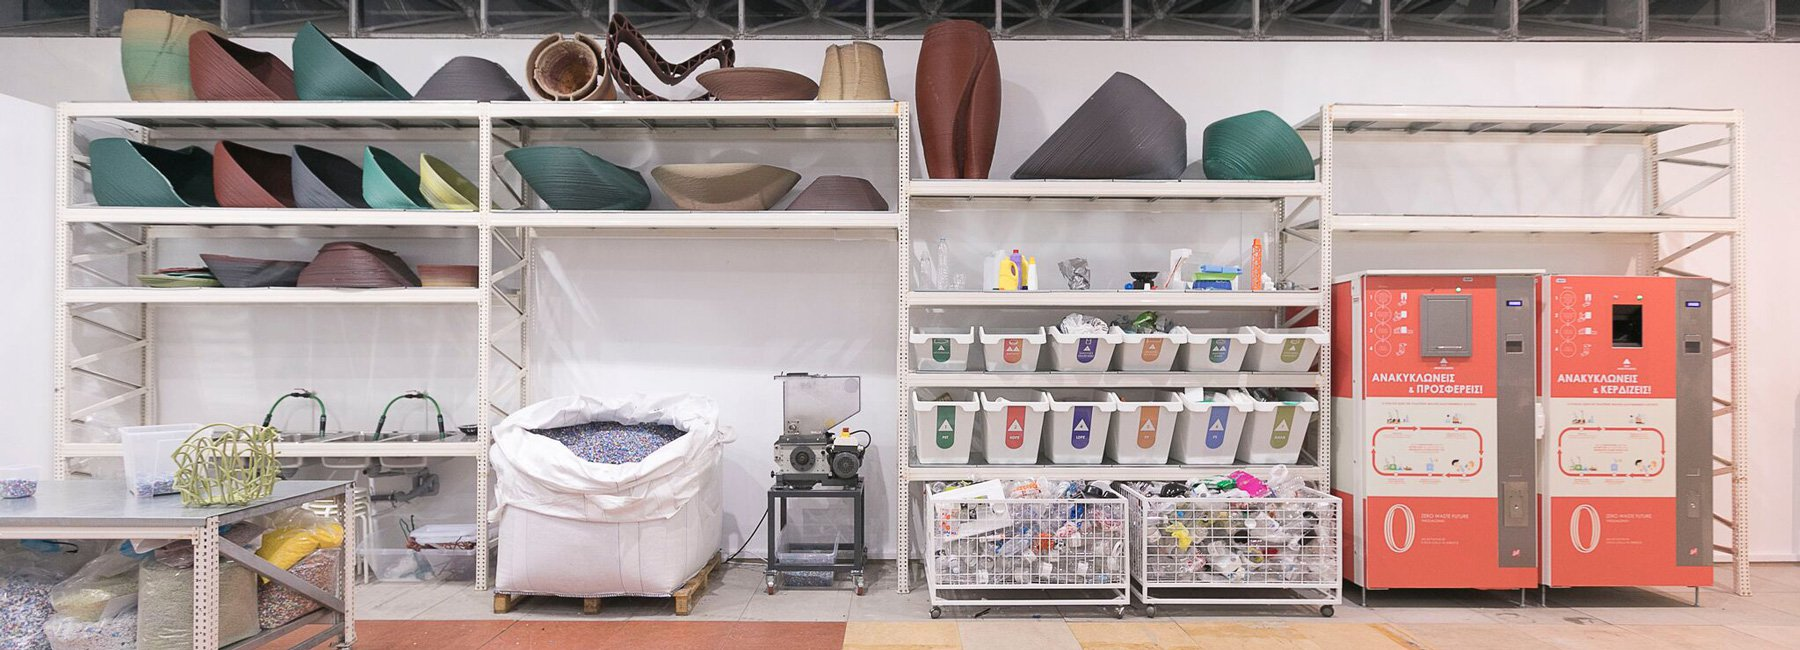 the-new-raw-zero-waste-lab-print-your-city-designboom-1800-1